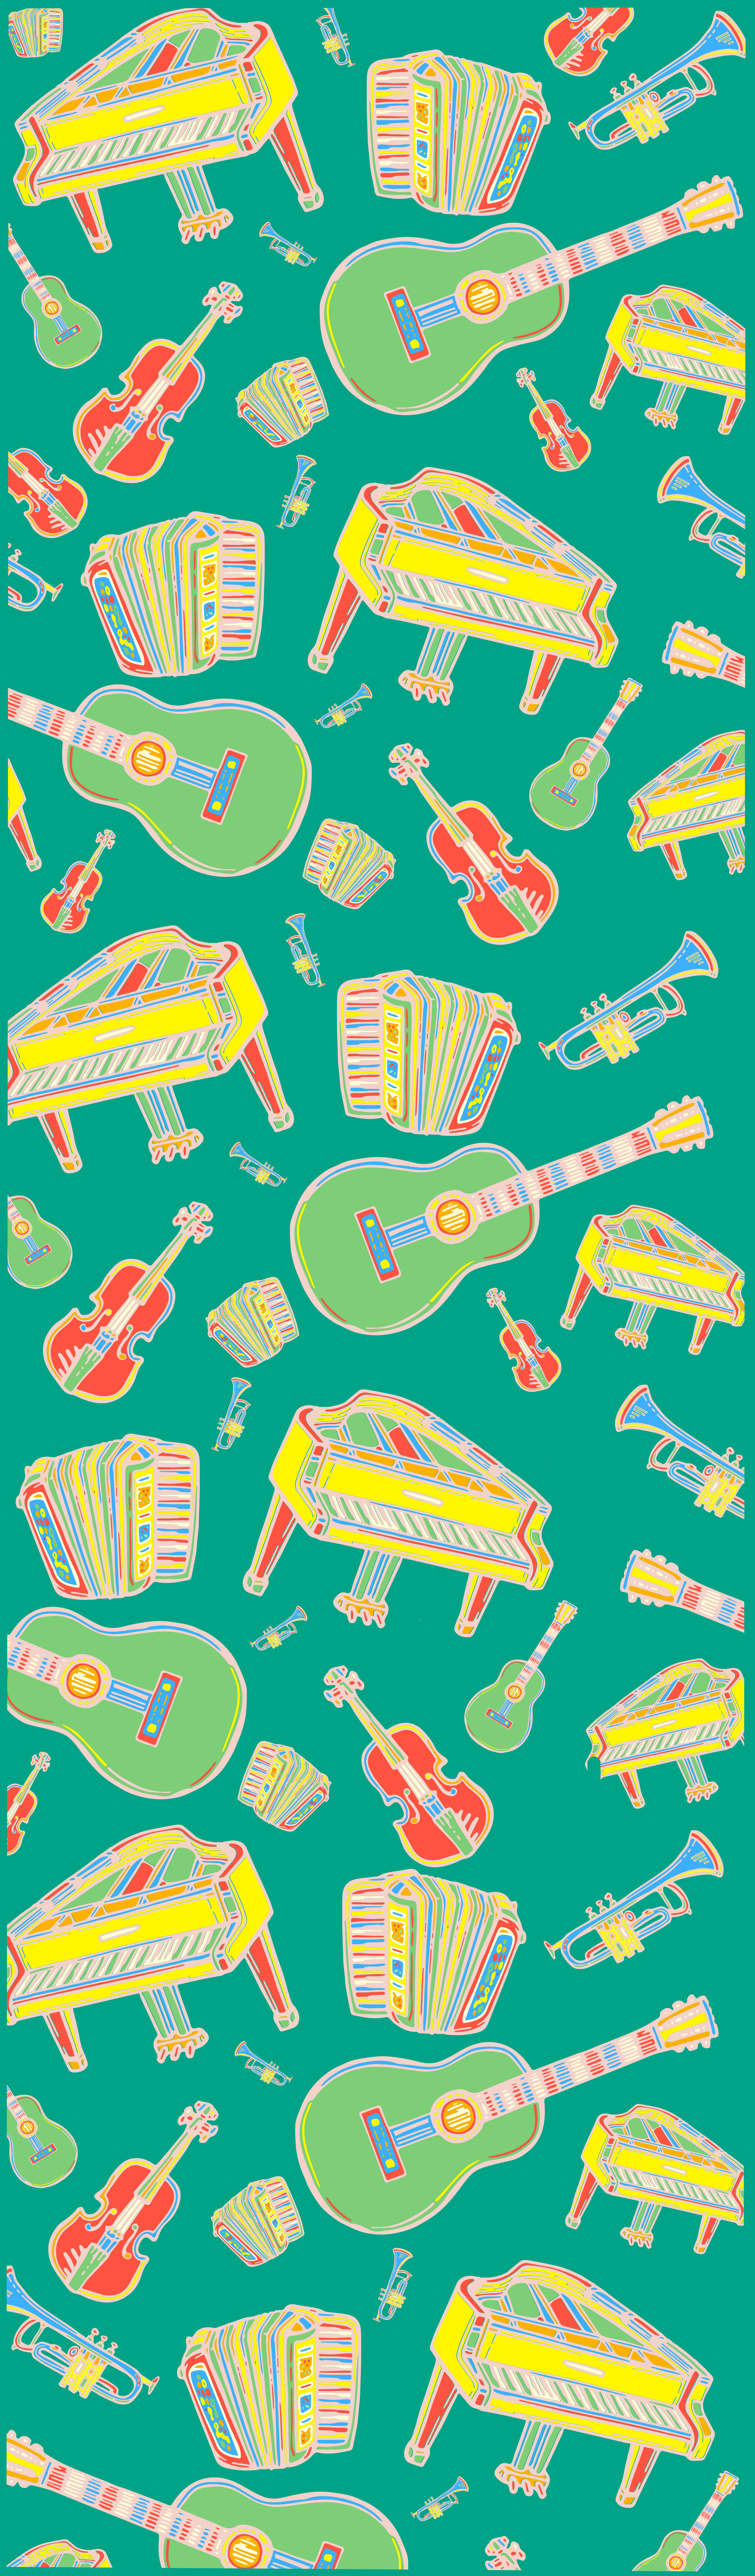 Music Room Wallpaper